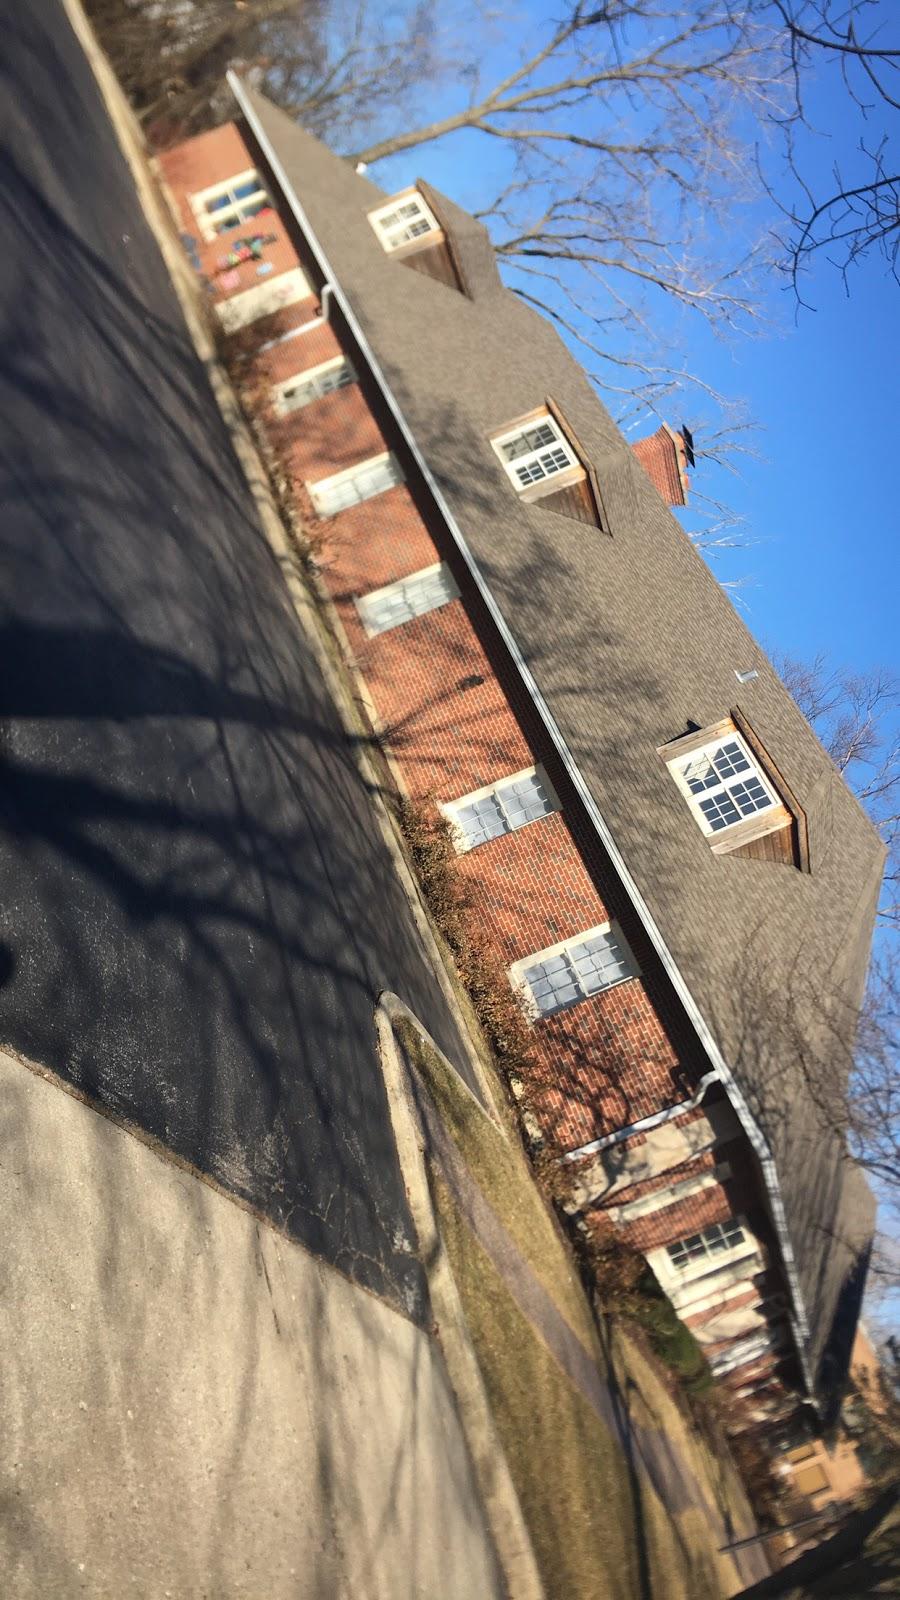 Berry Scuba & Swim School - travel agency  | Photo 6 of 10 | Address: 200 Northfield Rd, Northfield, IL 60093, USA | Phone: (847) 827-3100